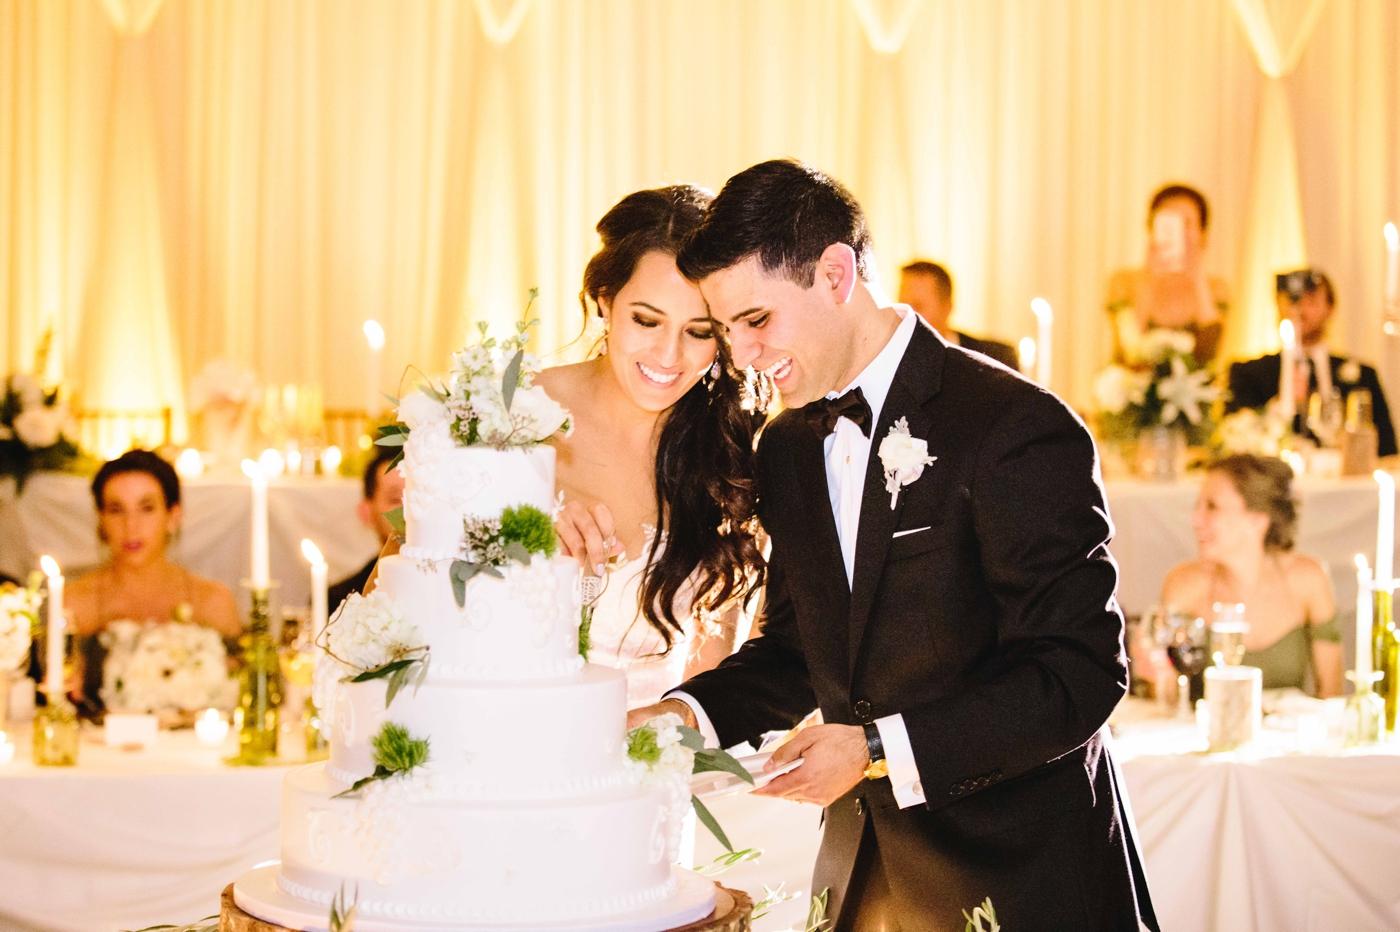 chicago-fine-art-wedding-photography-alfano24